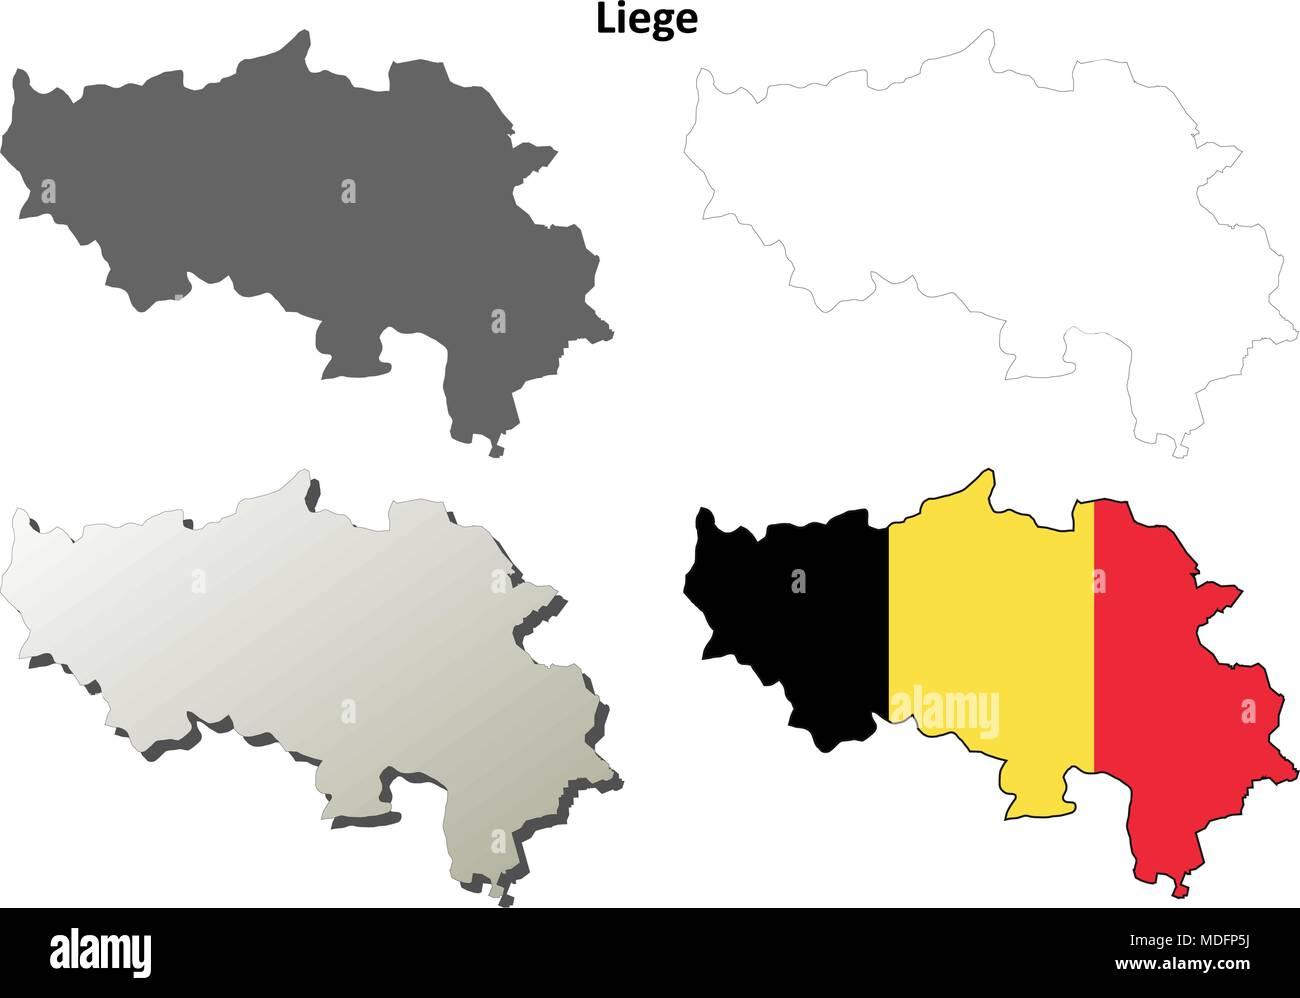 Belgien Karte Umriss.Lüttich Umriss Karte Set Belgische Version Vektor Abbildung Bild